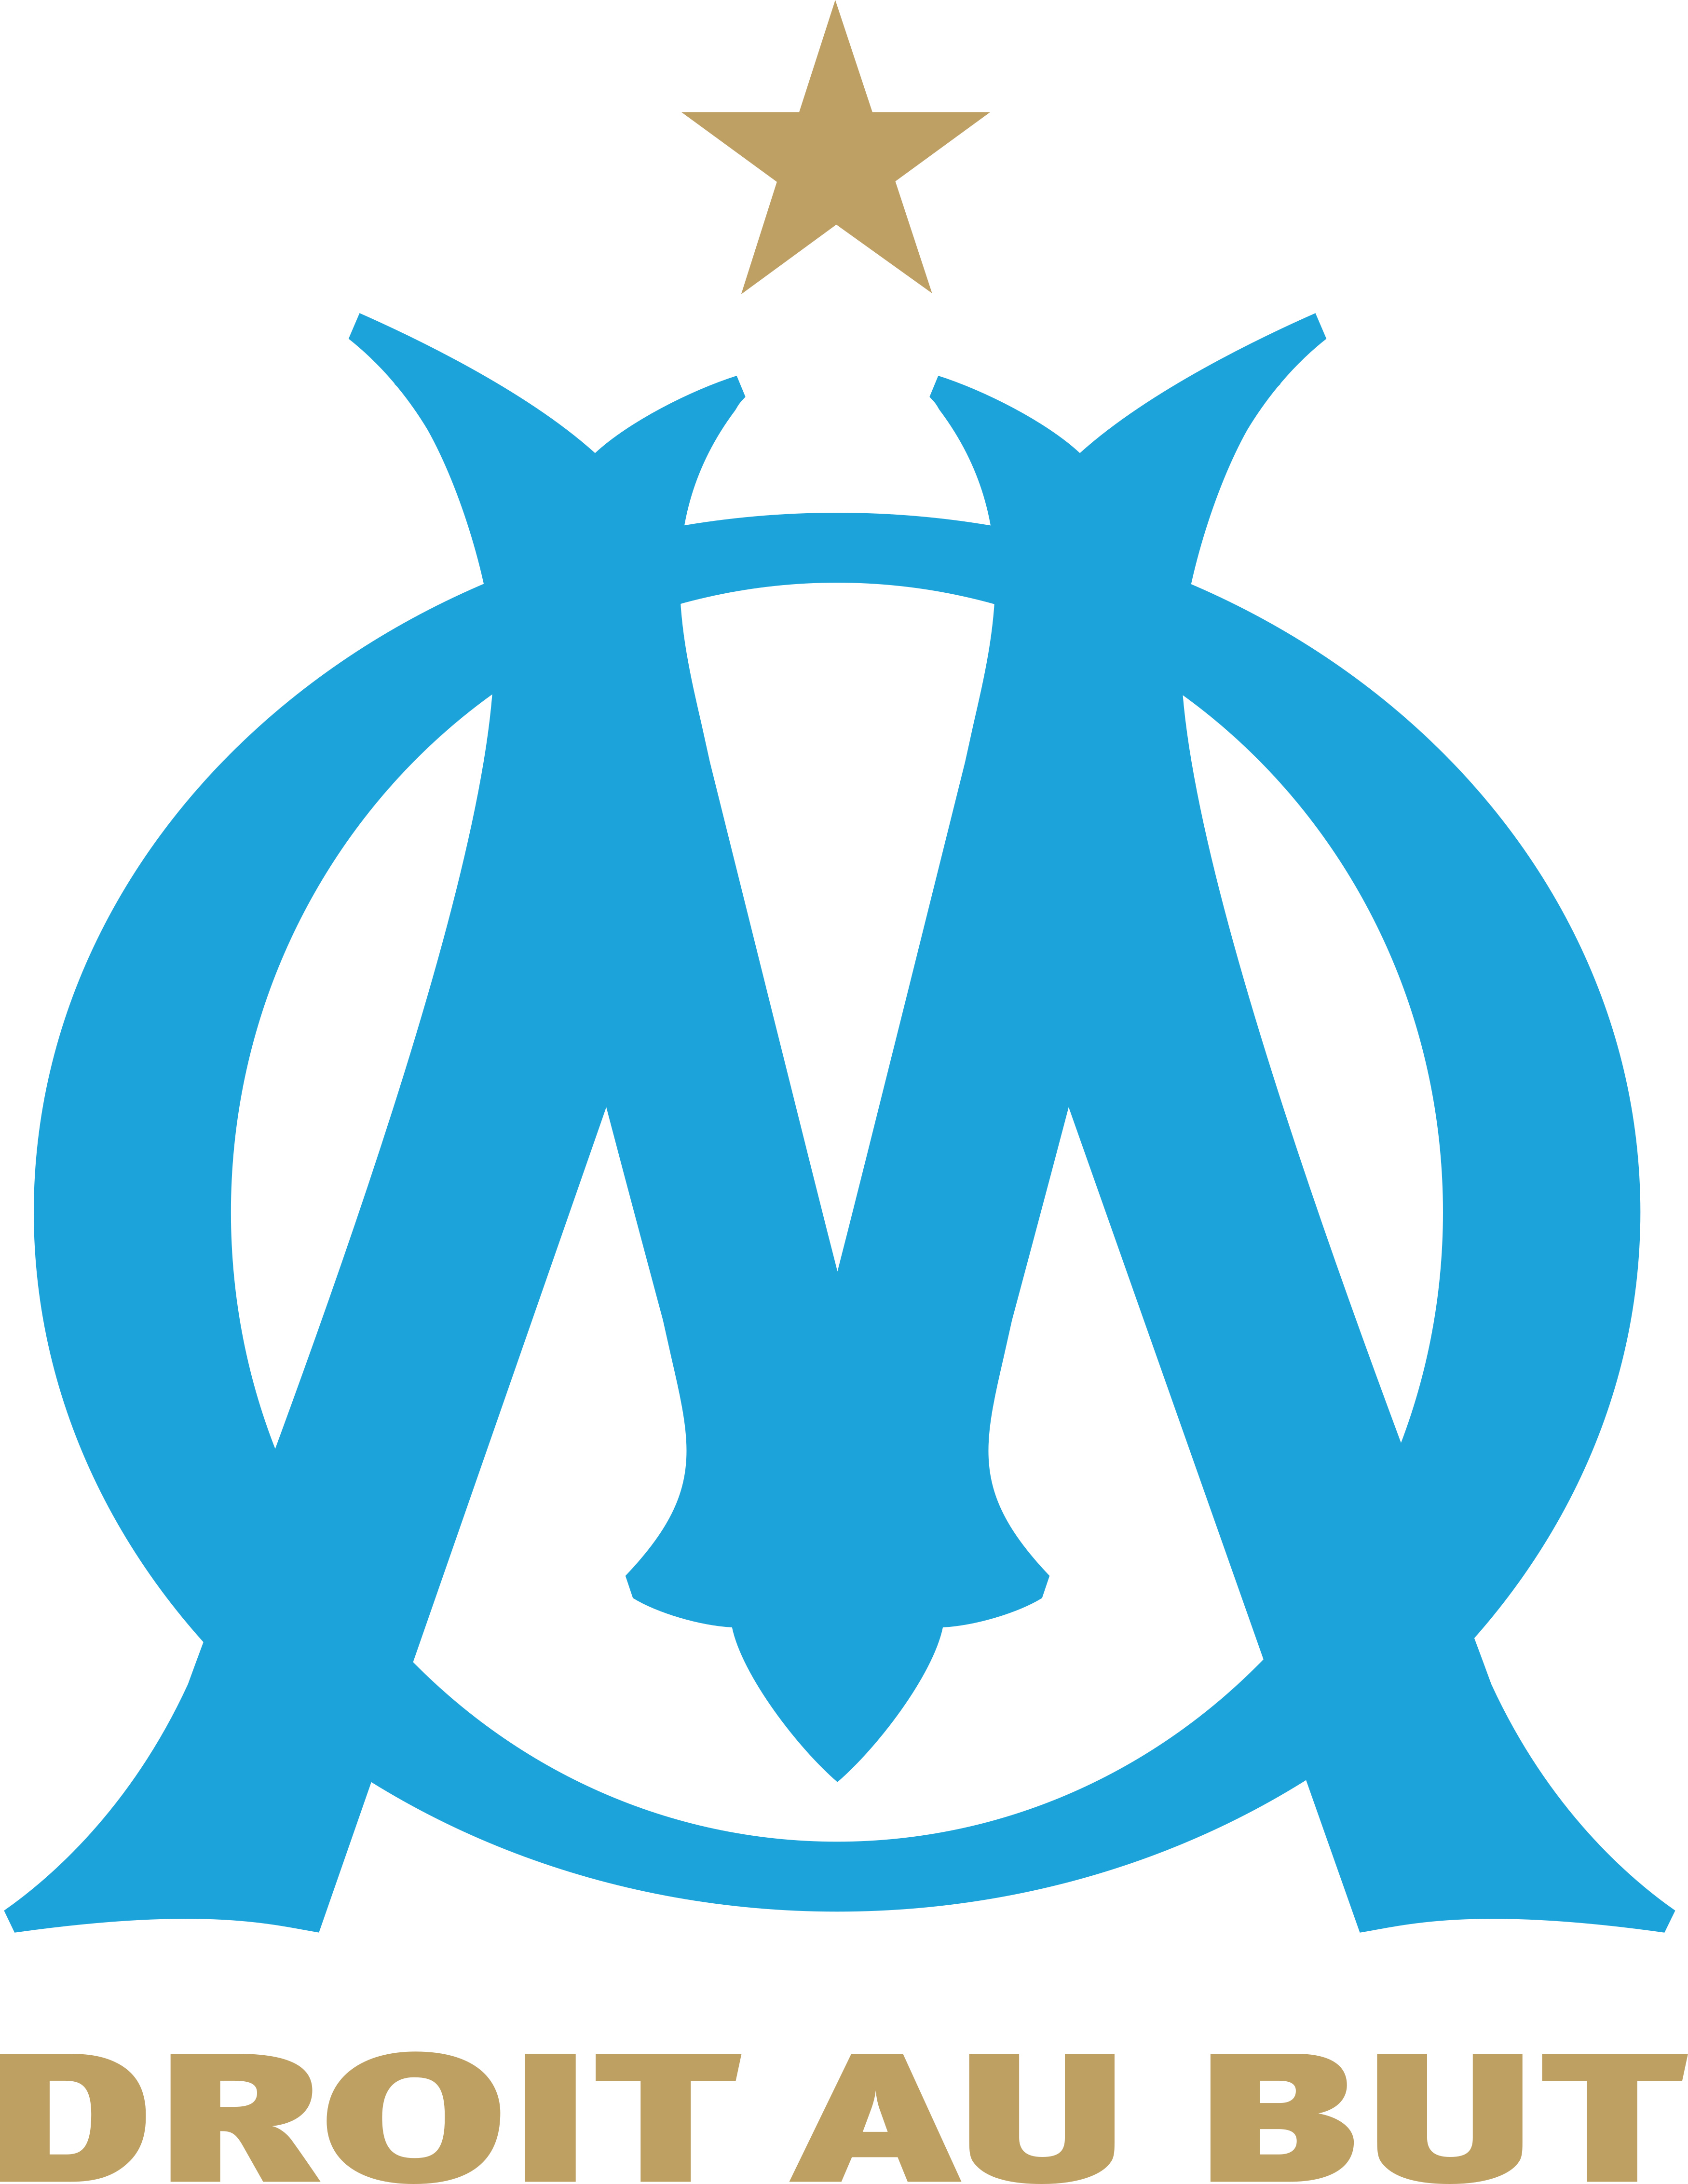 olympique de marseille - Olympique de Marseille Logo